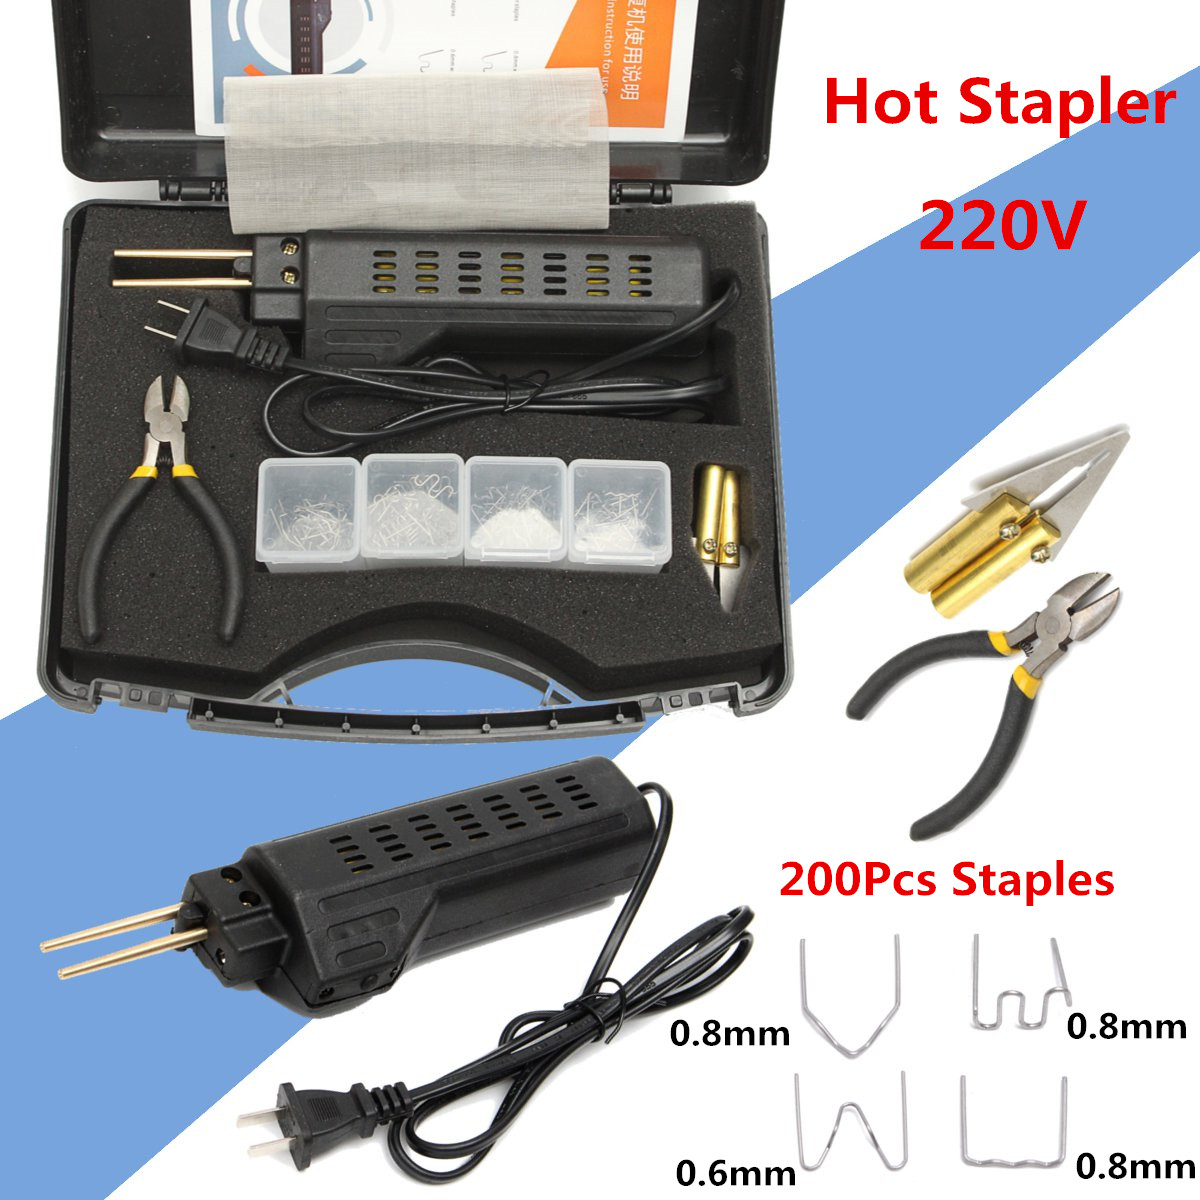 Welding Equipment Plastic Welders 200 Staples New 220-250v Hot Stapler Car Bumper Plastic Welding Torch Fairing Auto Body Tool Welder Machine 0.6/0.8mm